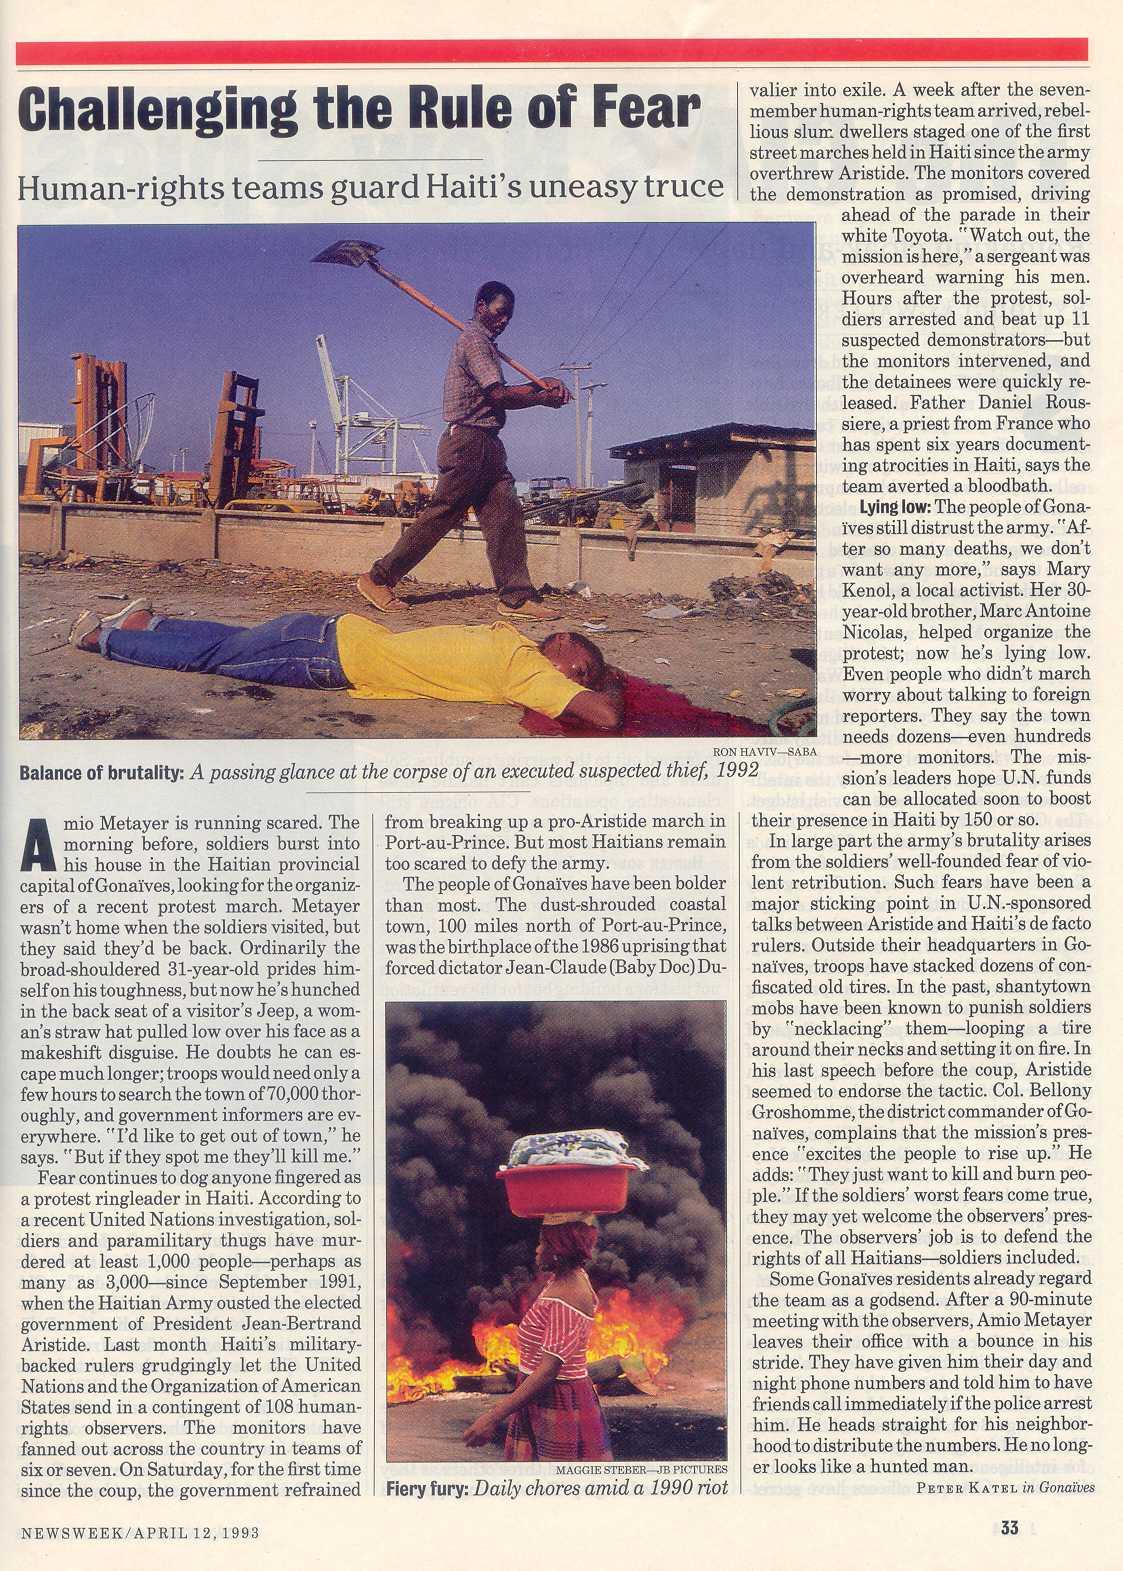 Peter Katel in Gonaives, Haiti – NEWSWEEK Magazine (1993)